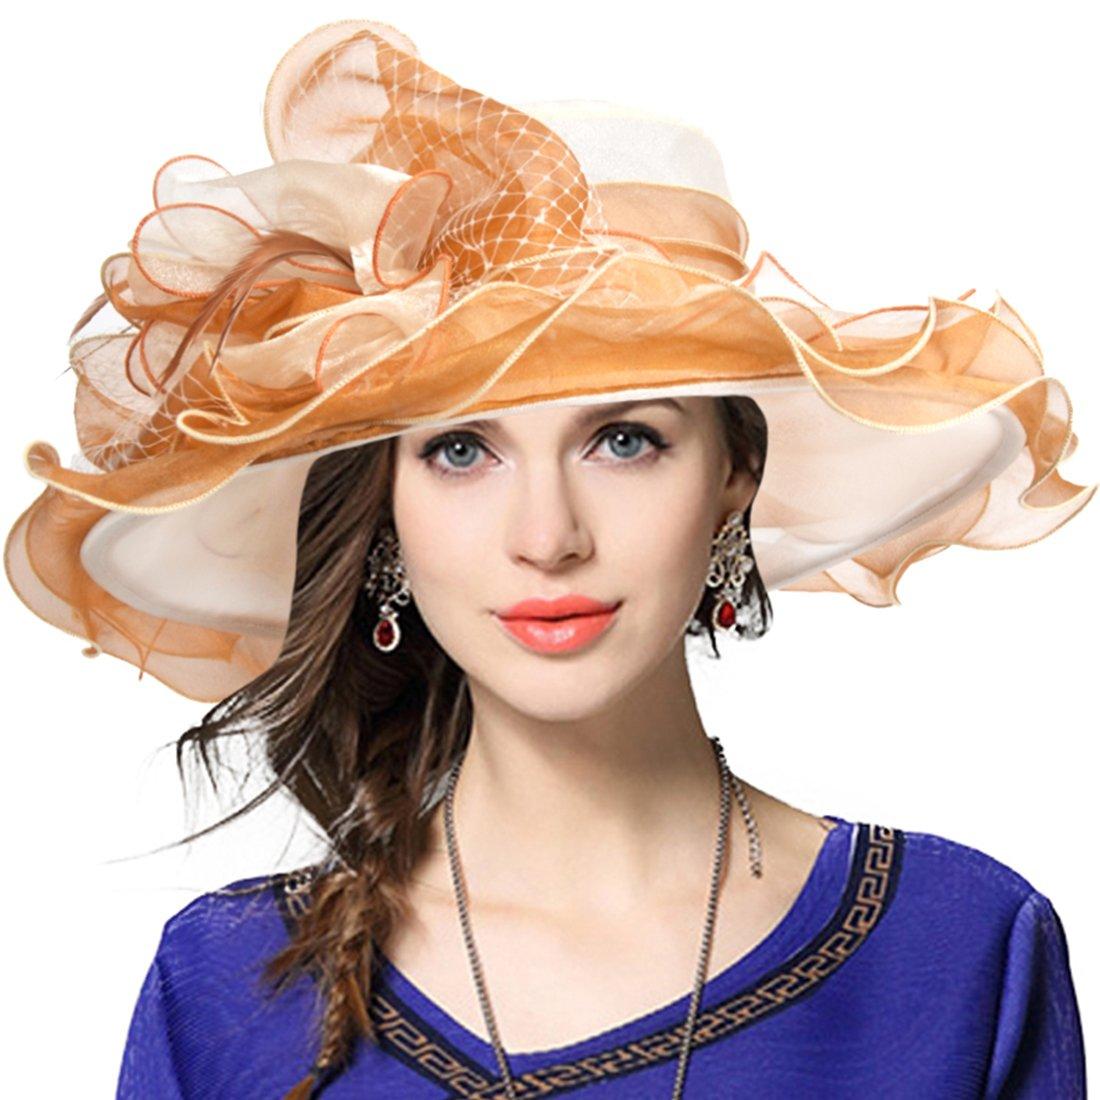 JESSE · RENA Women's Church Derby Dress Fascinator Bridal Cap British Tea Party Wedding Hat (Two-Tone-Apricot)